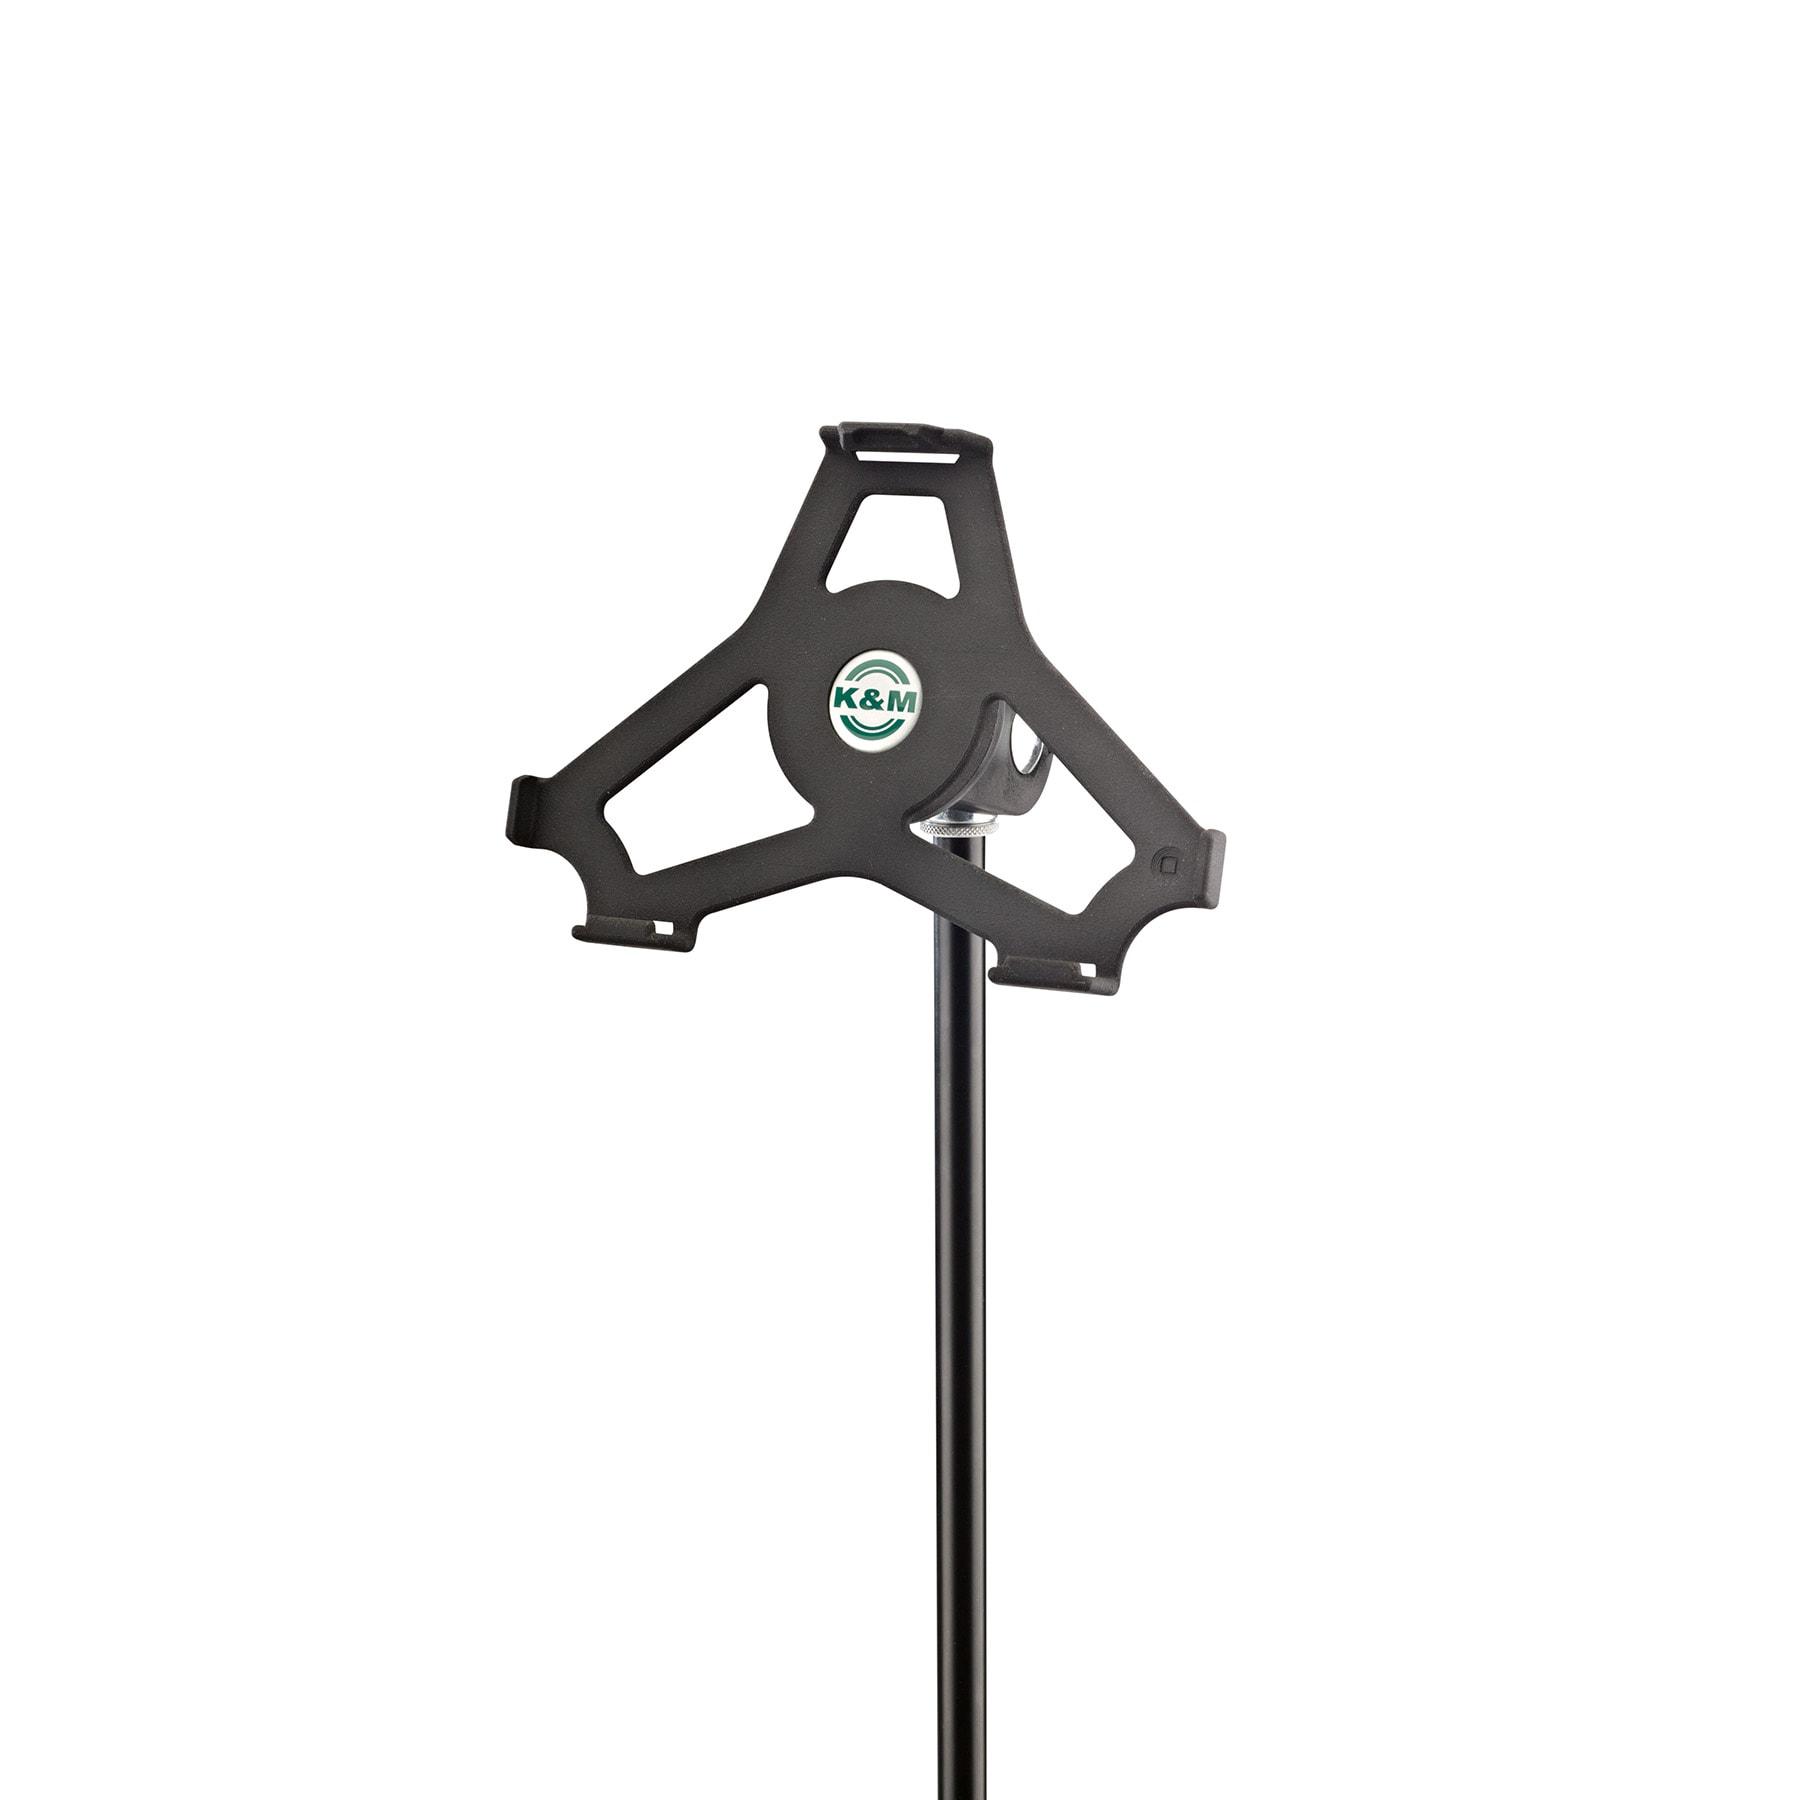 KM19713 - Ipad mini stand holder